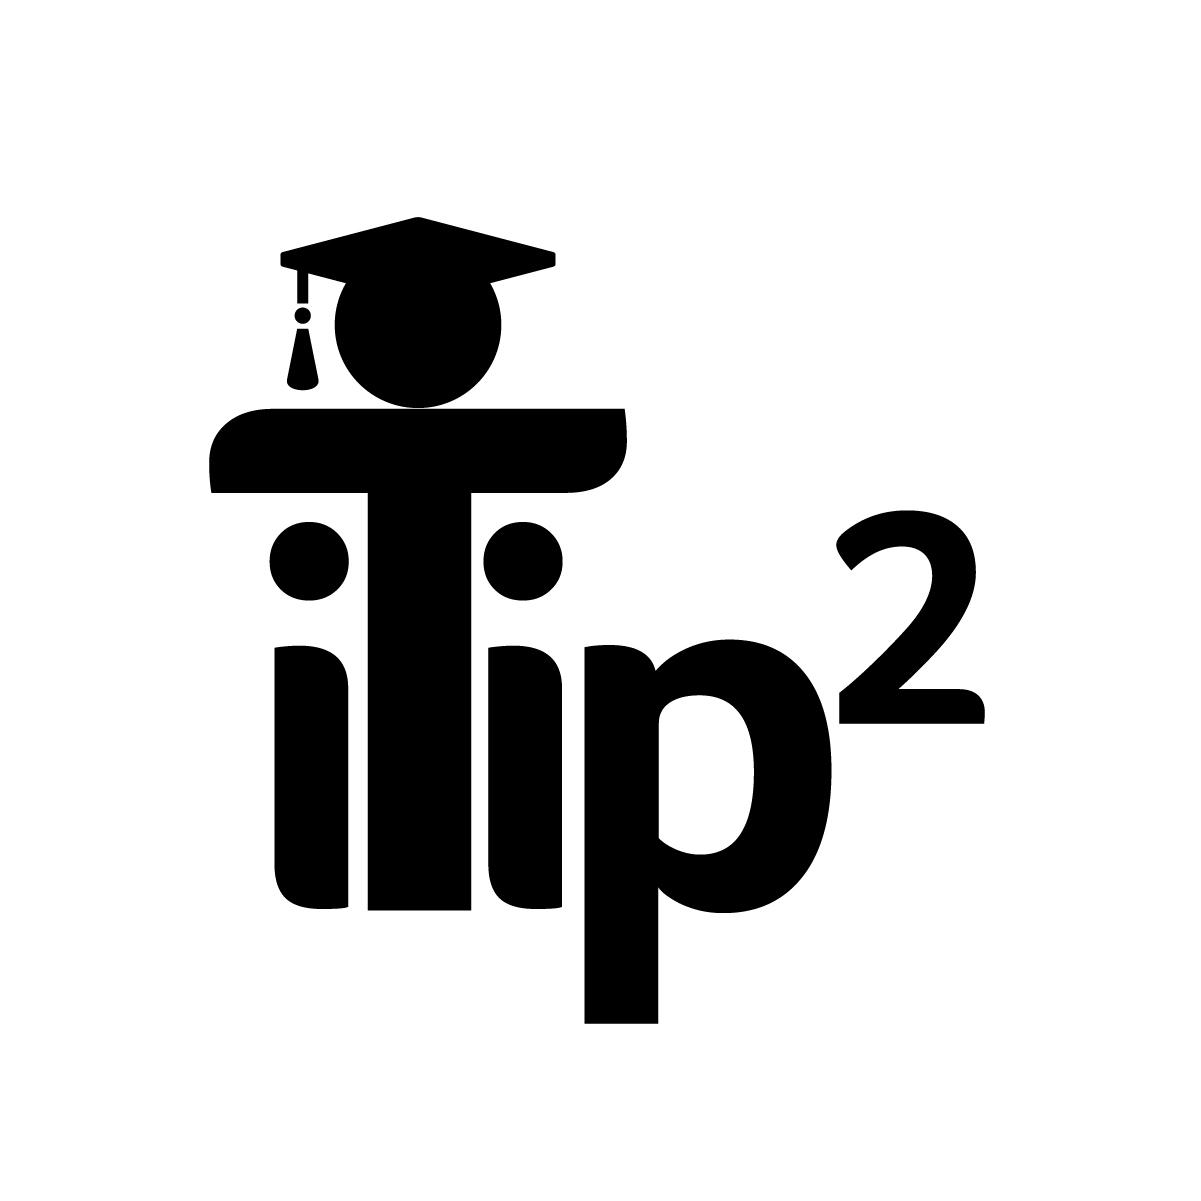 ITIP² logo